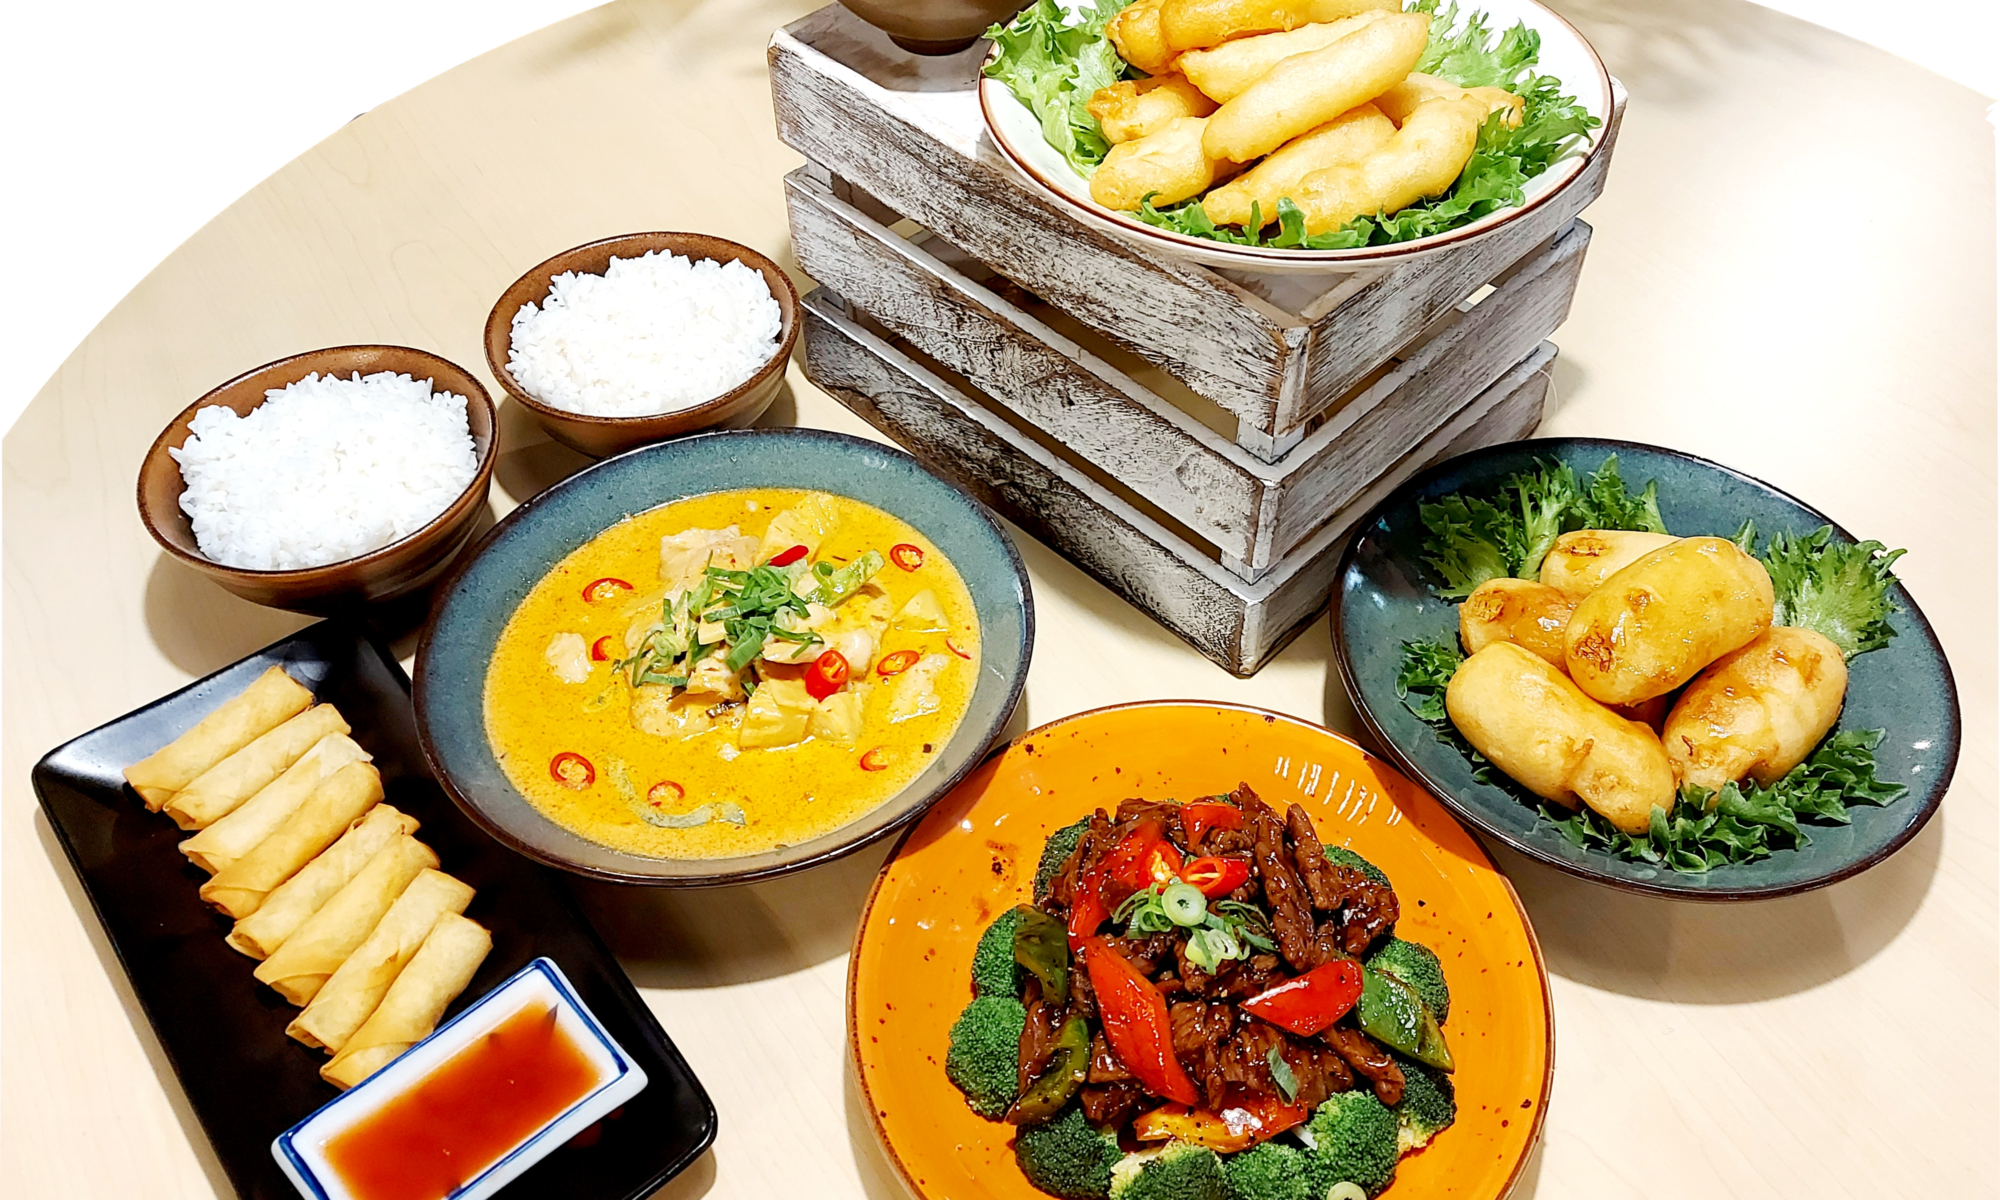 Family wok setti tarjous 45€